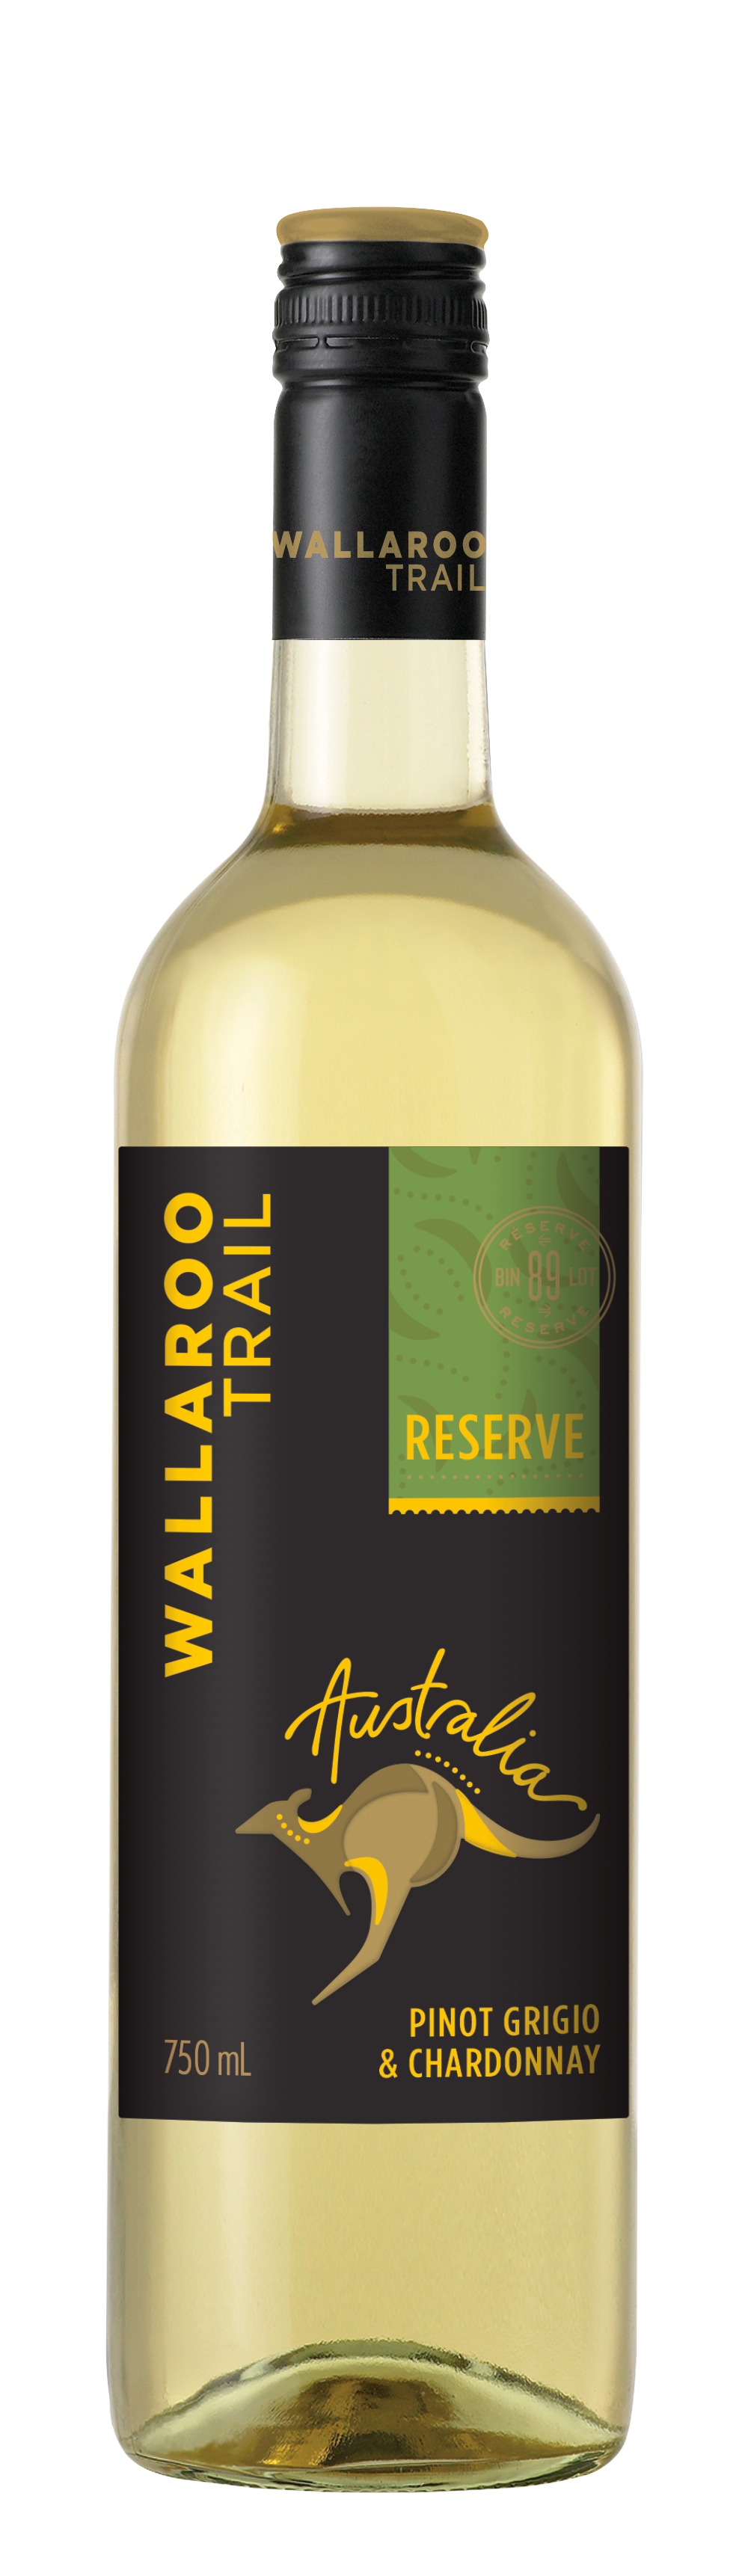 Wallaroo Trail Reserve Pinot grigio / Chardonnay